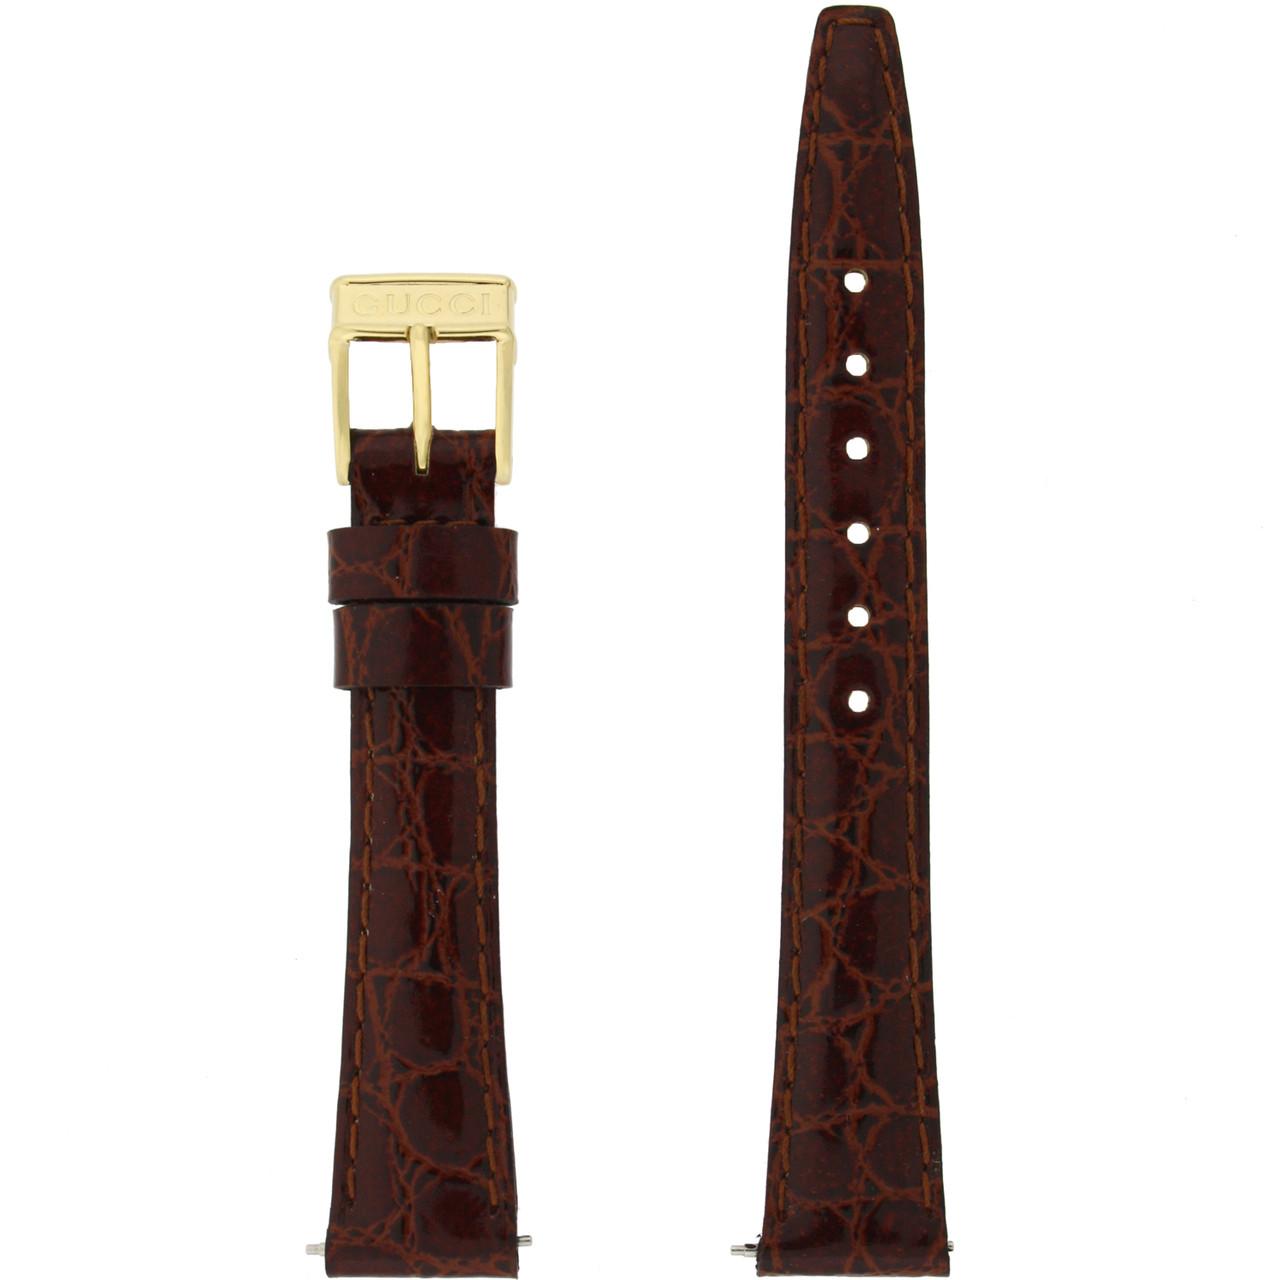 Gucci Watch Strap 13mm Brown models 2200L 3000L Crocodiledile Grain - Main front